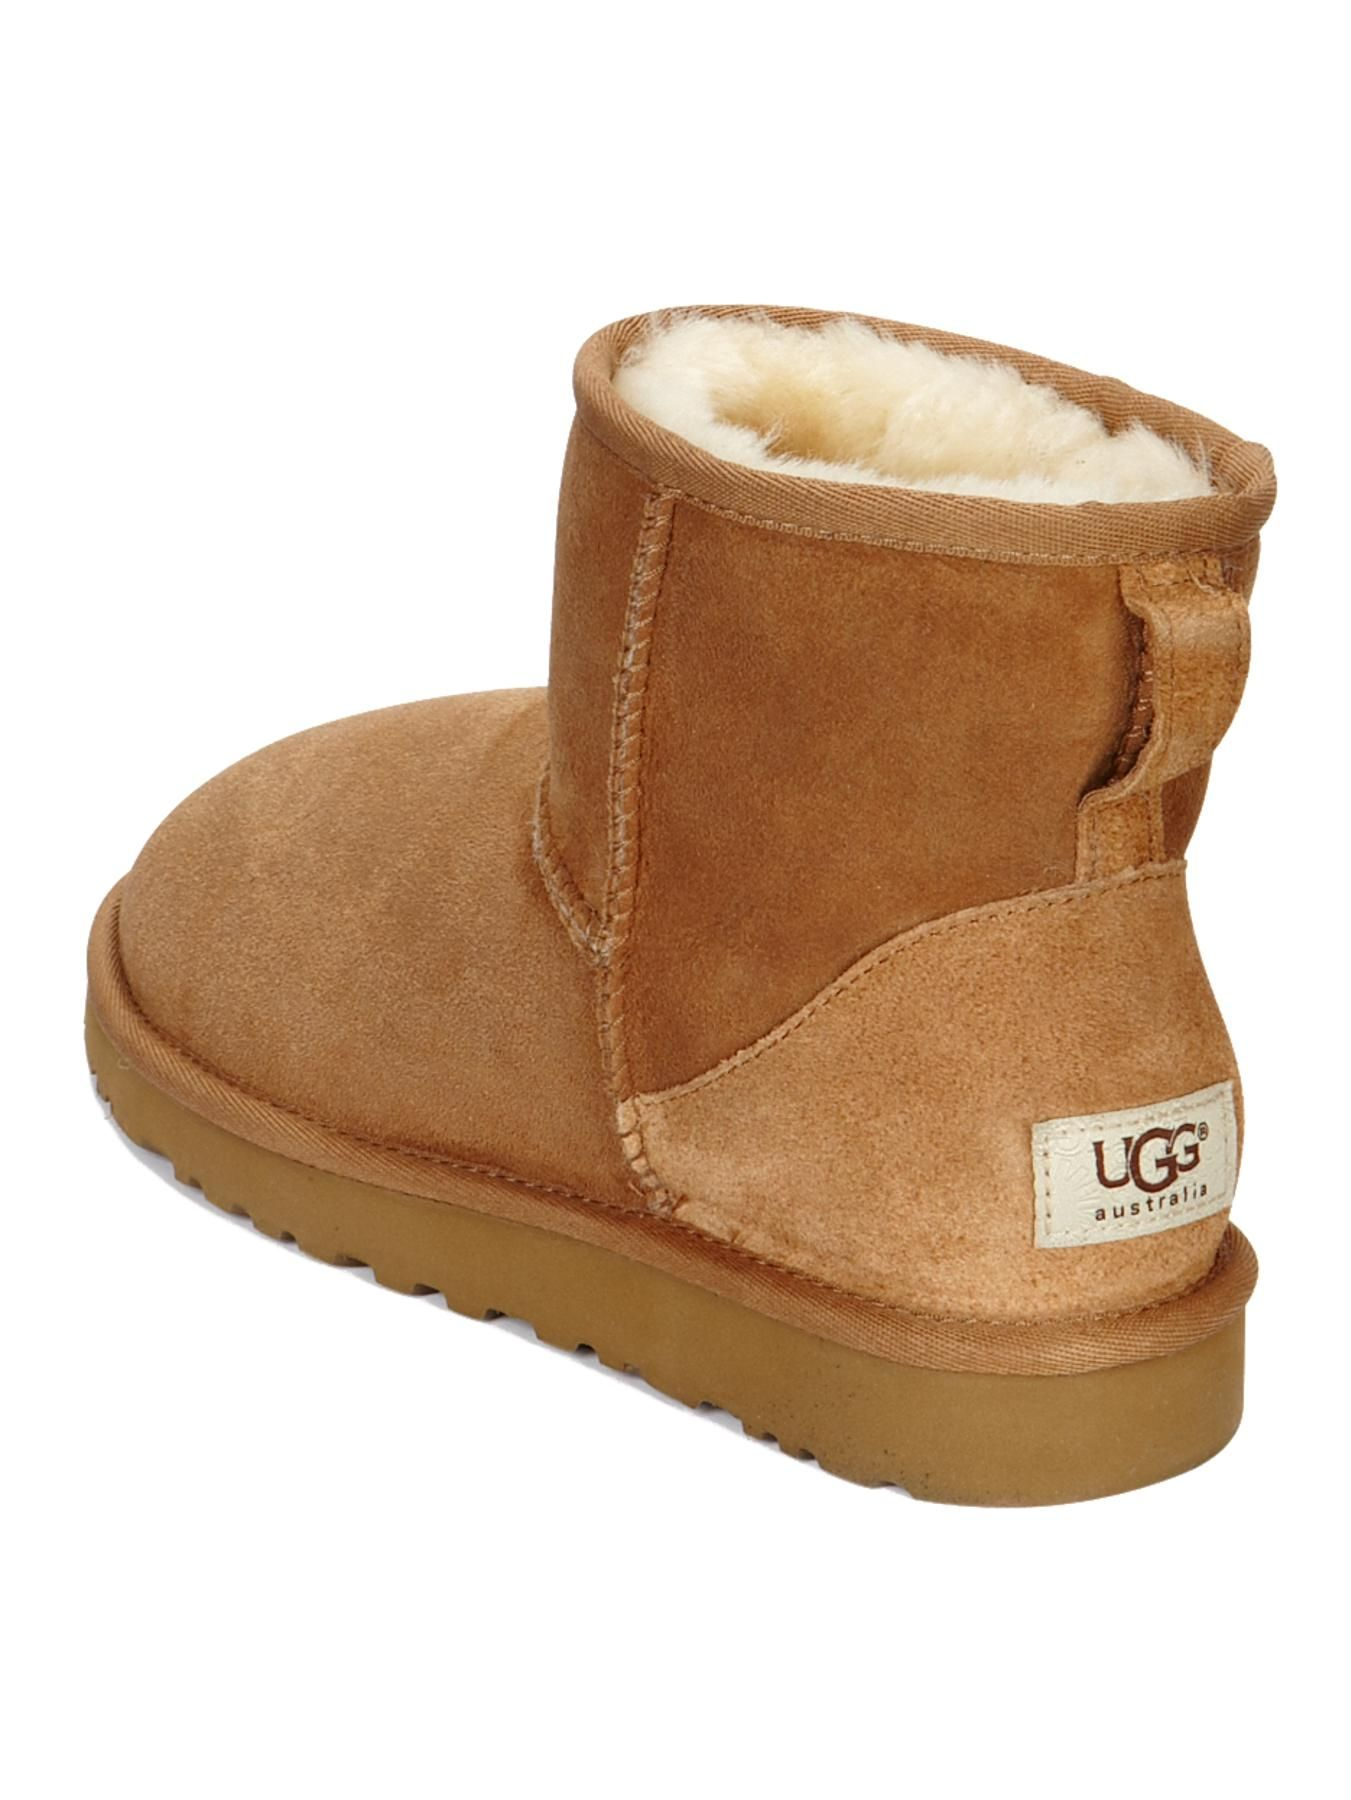 Johnson S Comfort Shoes Redding Ca